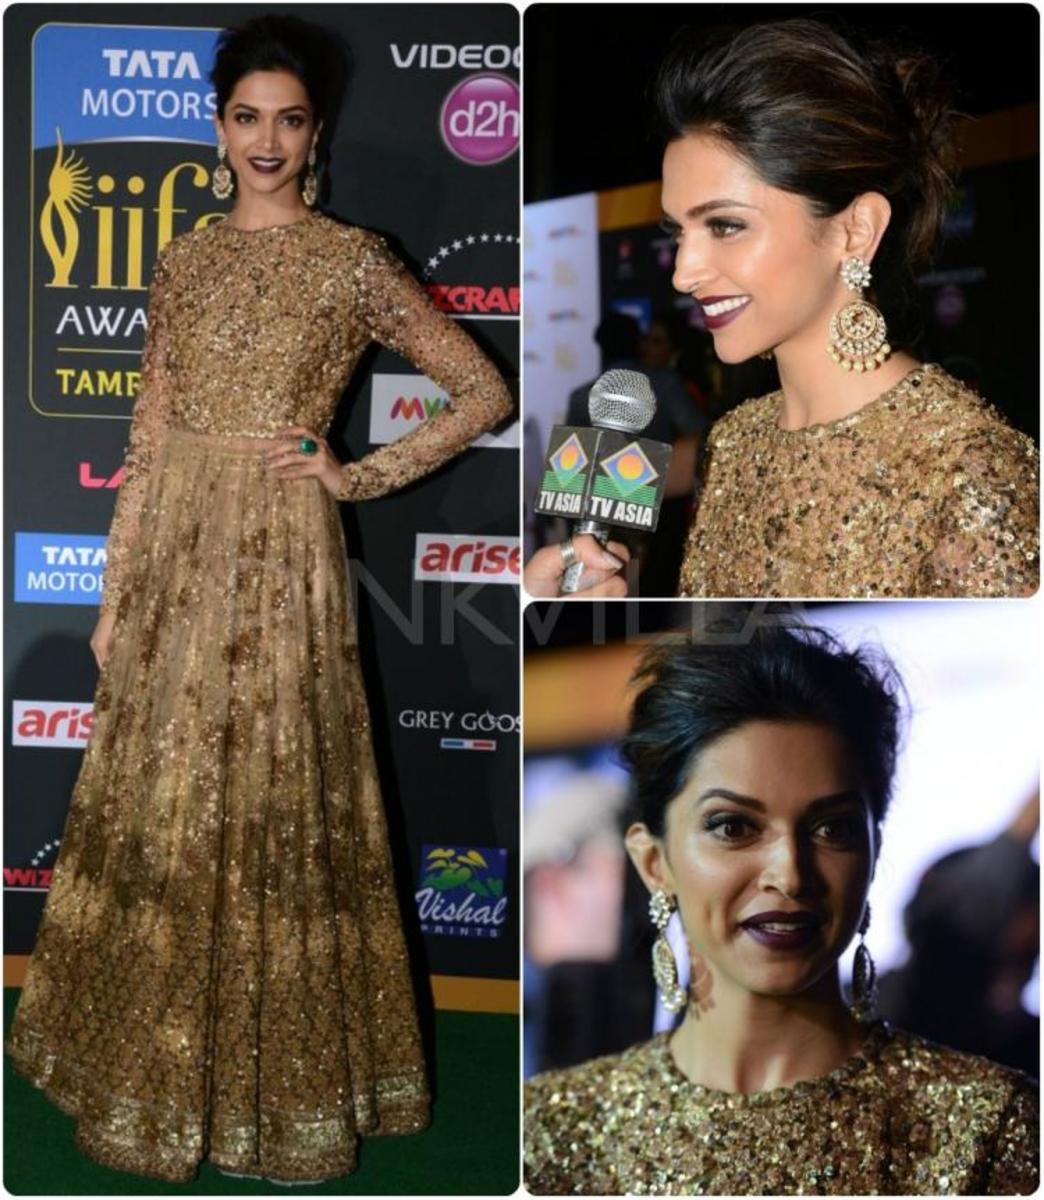 Deepika looking stunning in sabyasachi